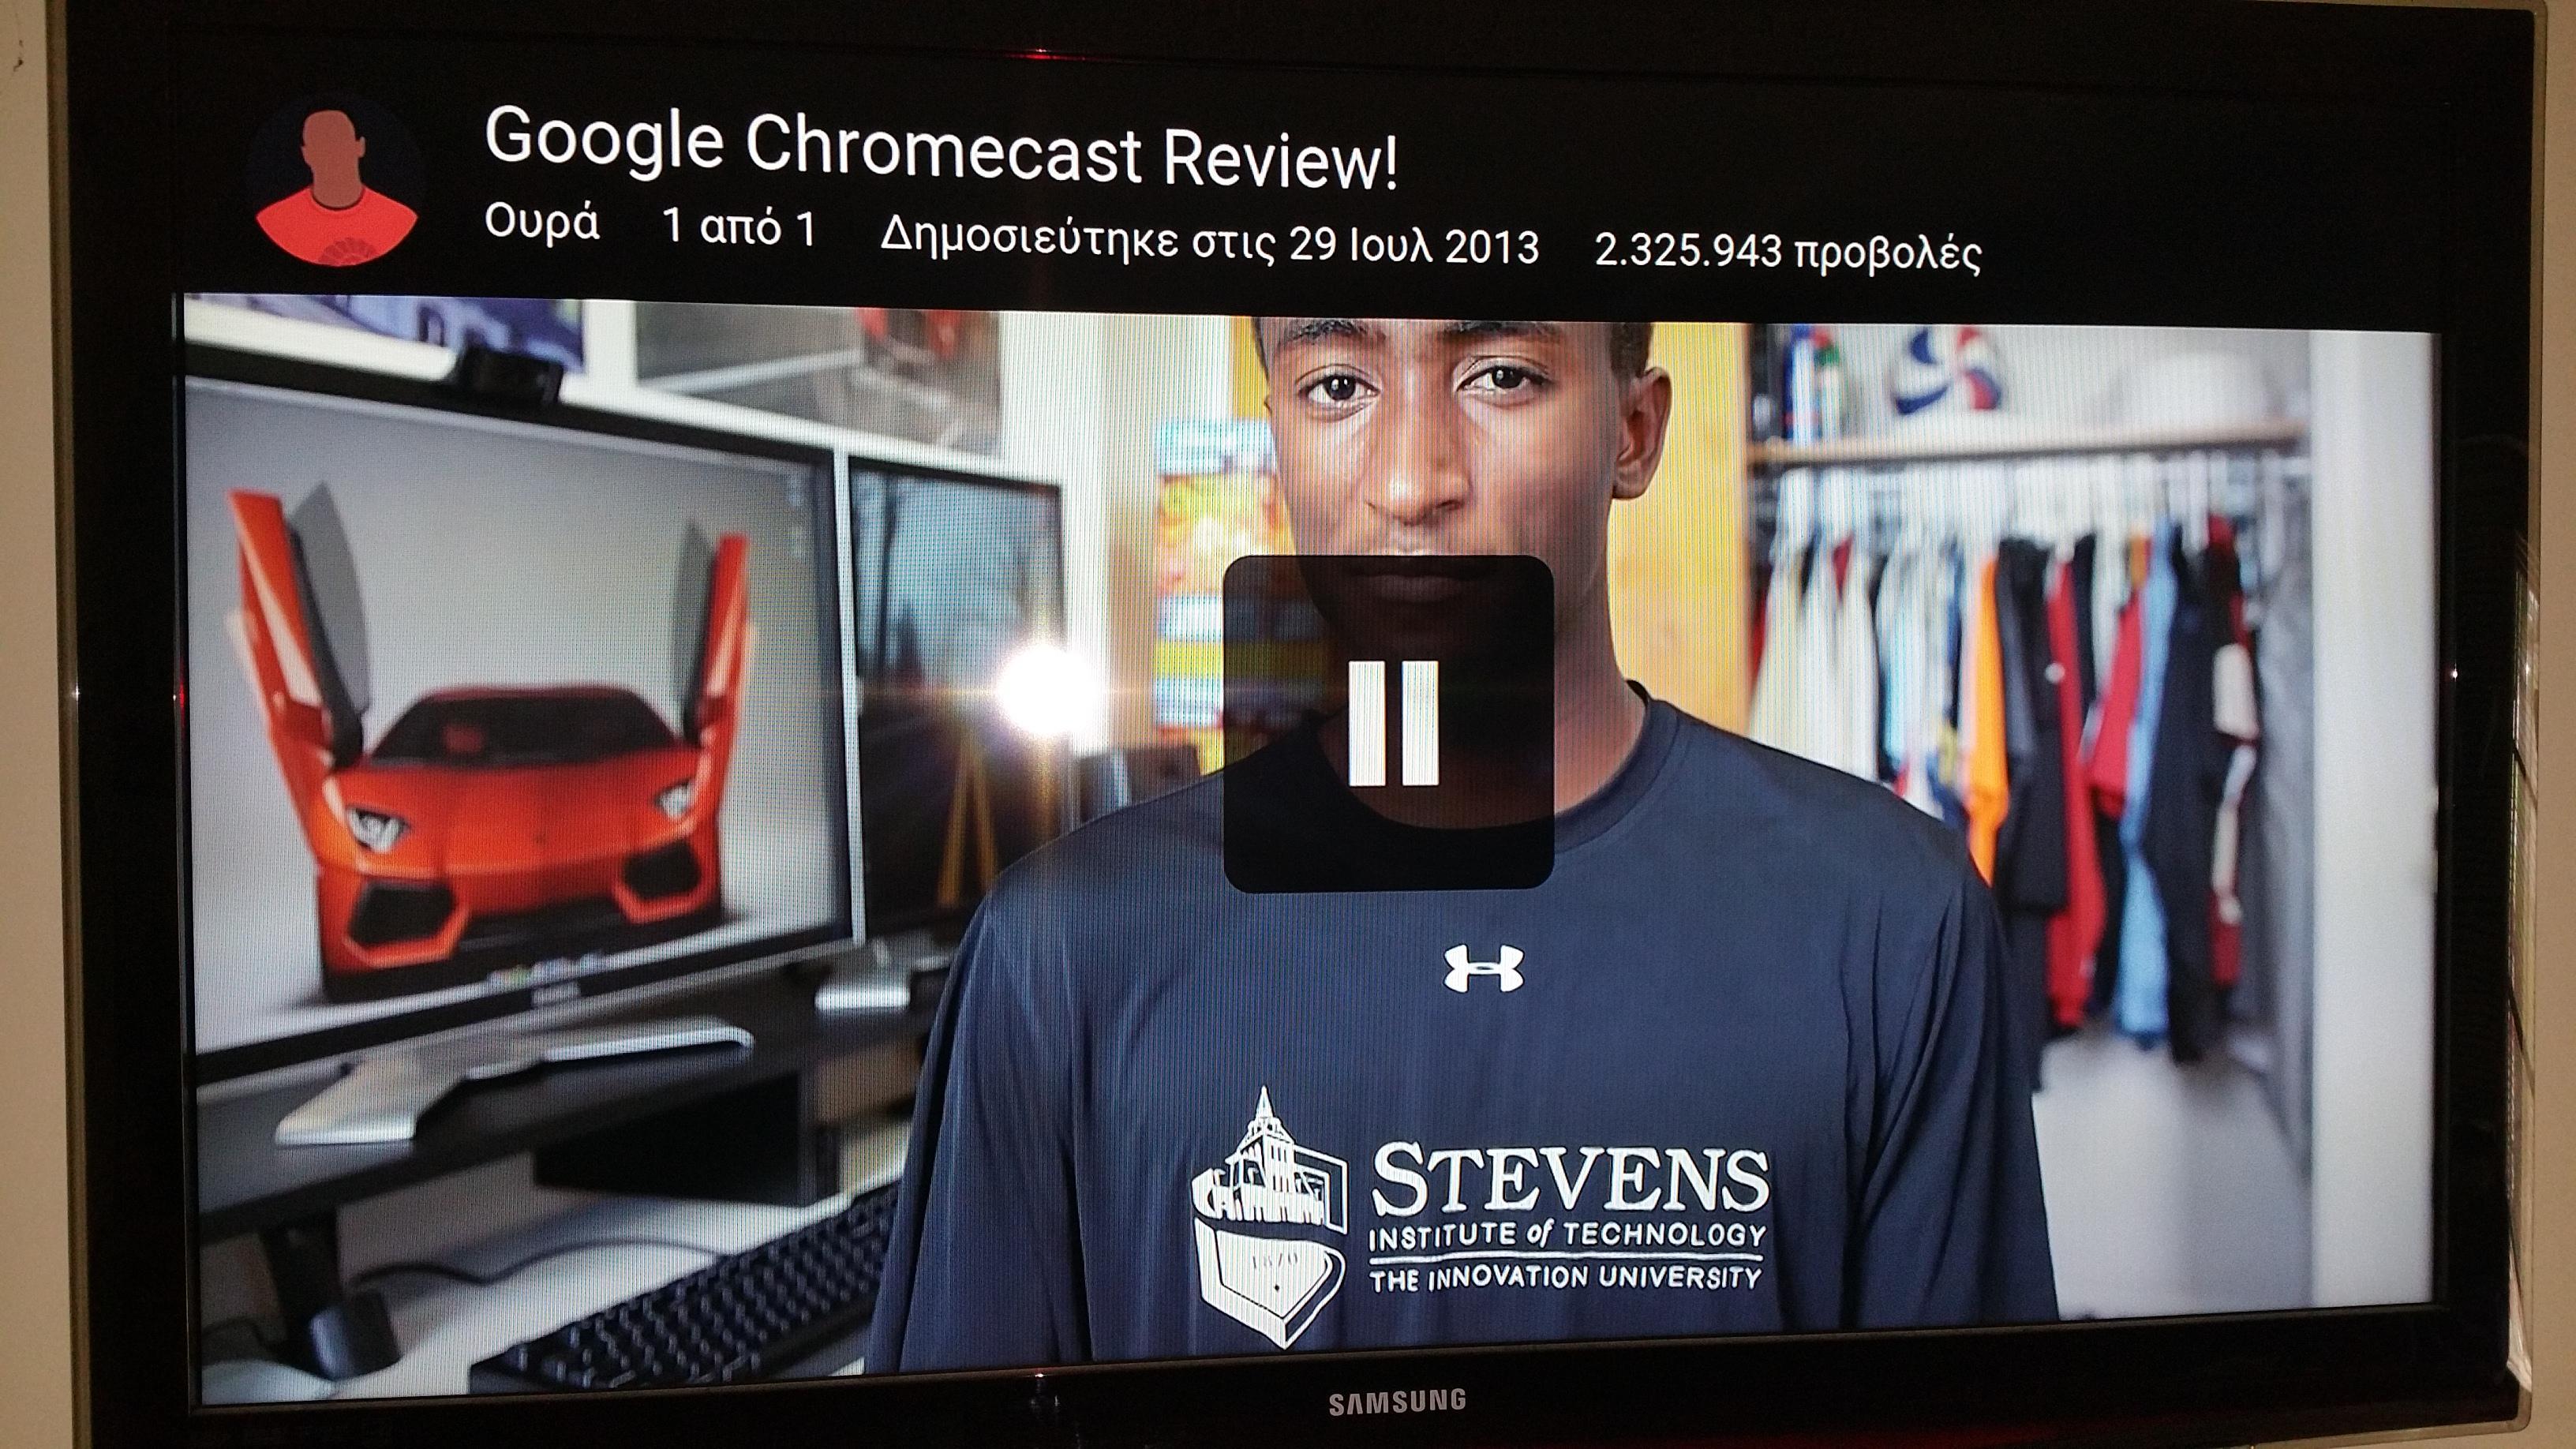 Foreign language titles on youtube - Chromecast Help